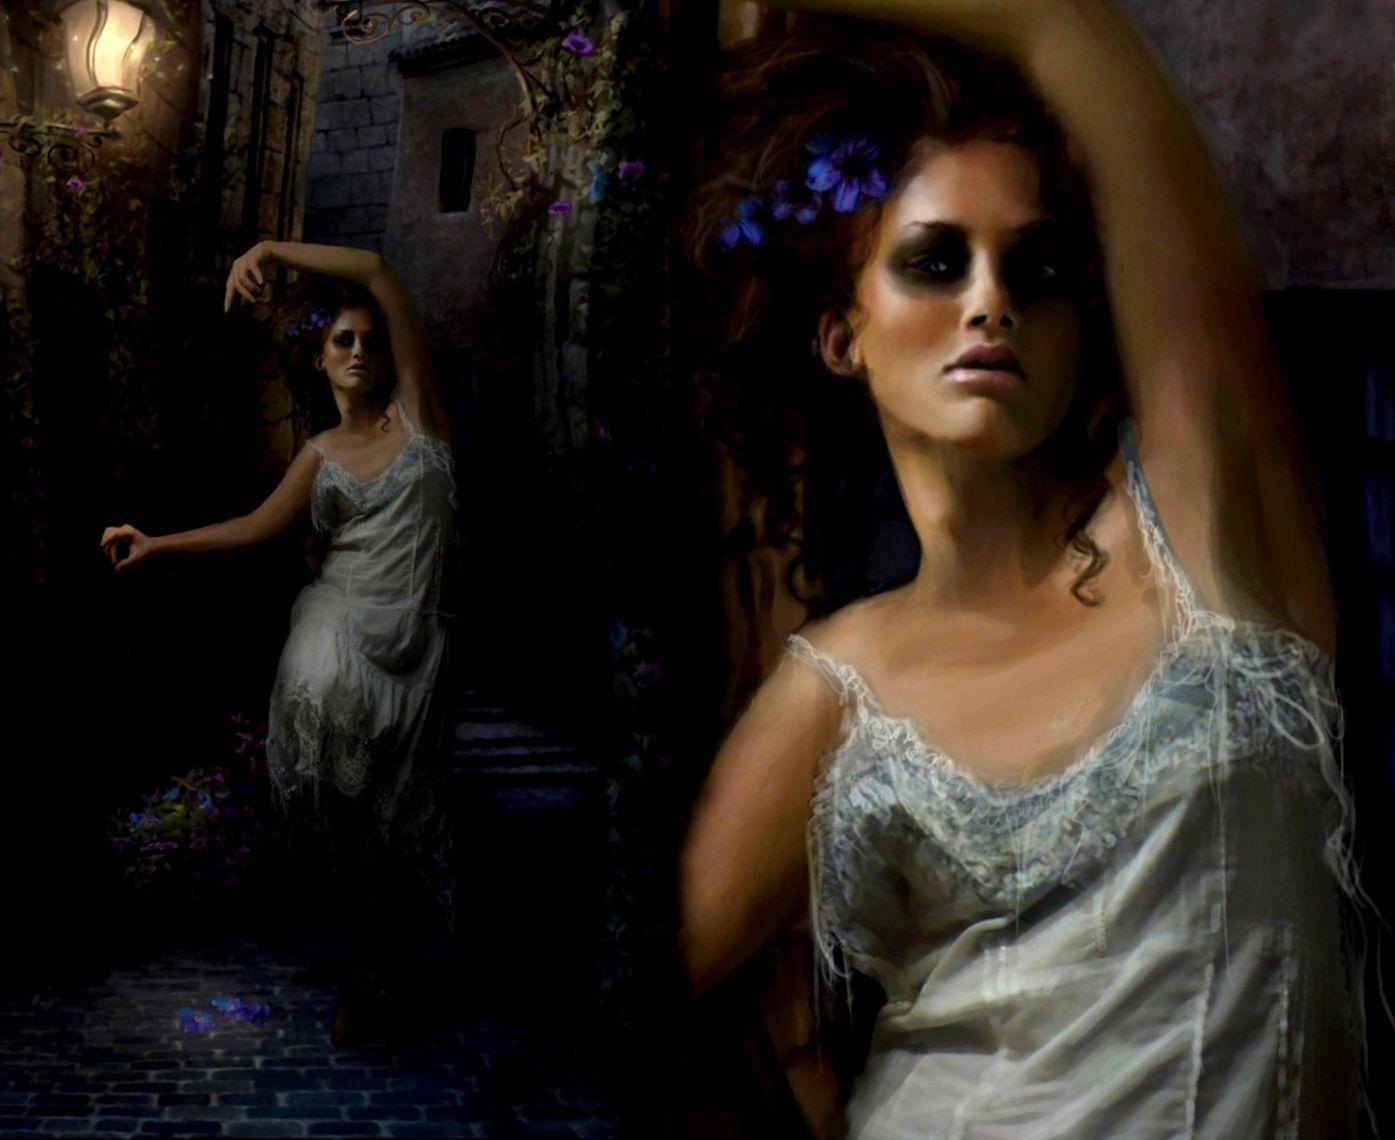 Fashion Model Hannah Duggan Girl Hd Wallpaper Missmermmaid